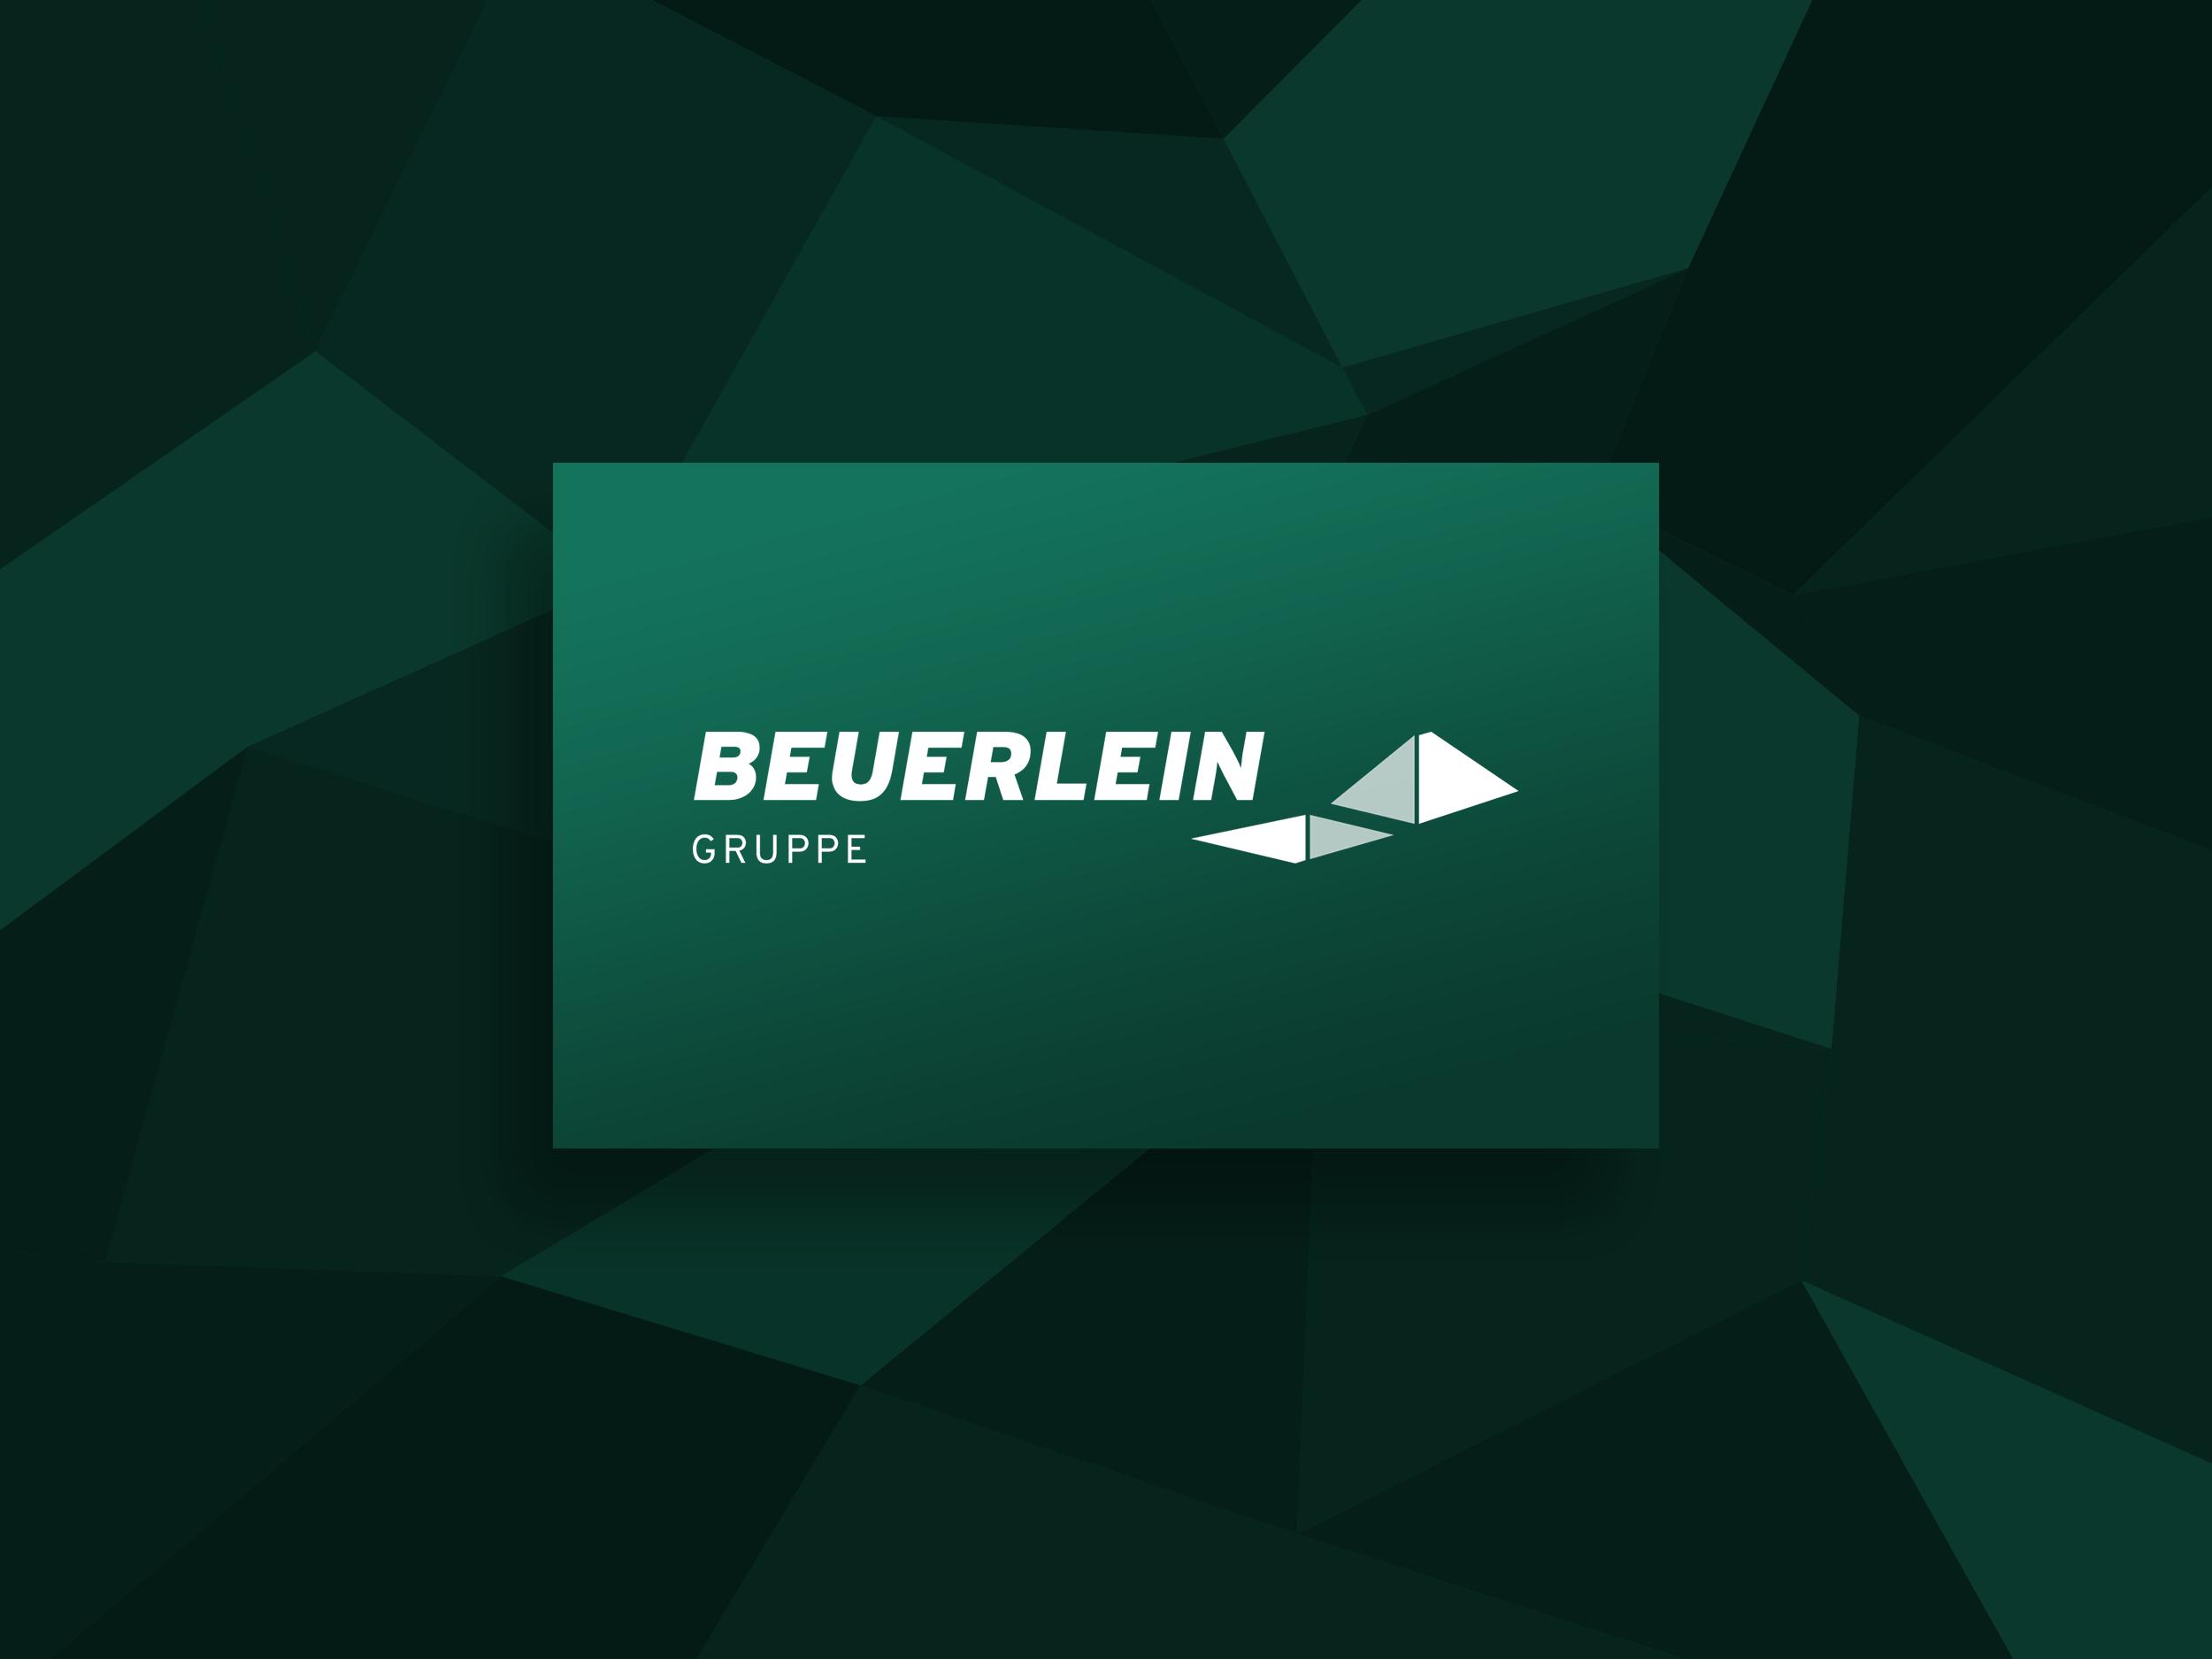 Beuerlein-Gruppe